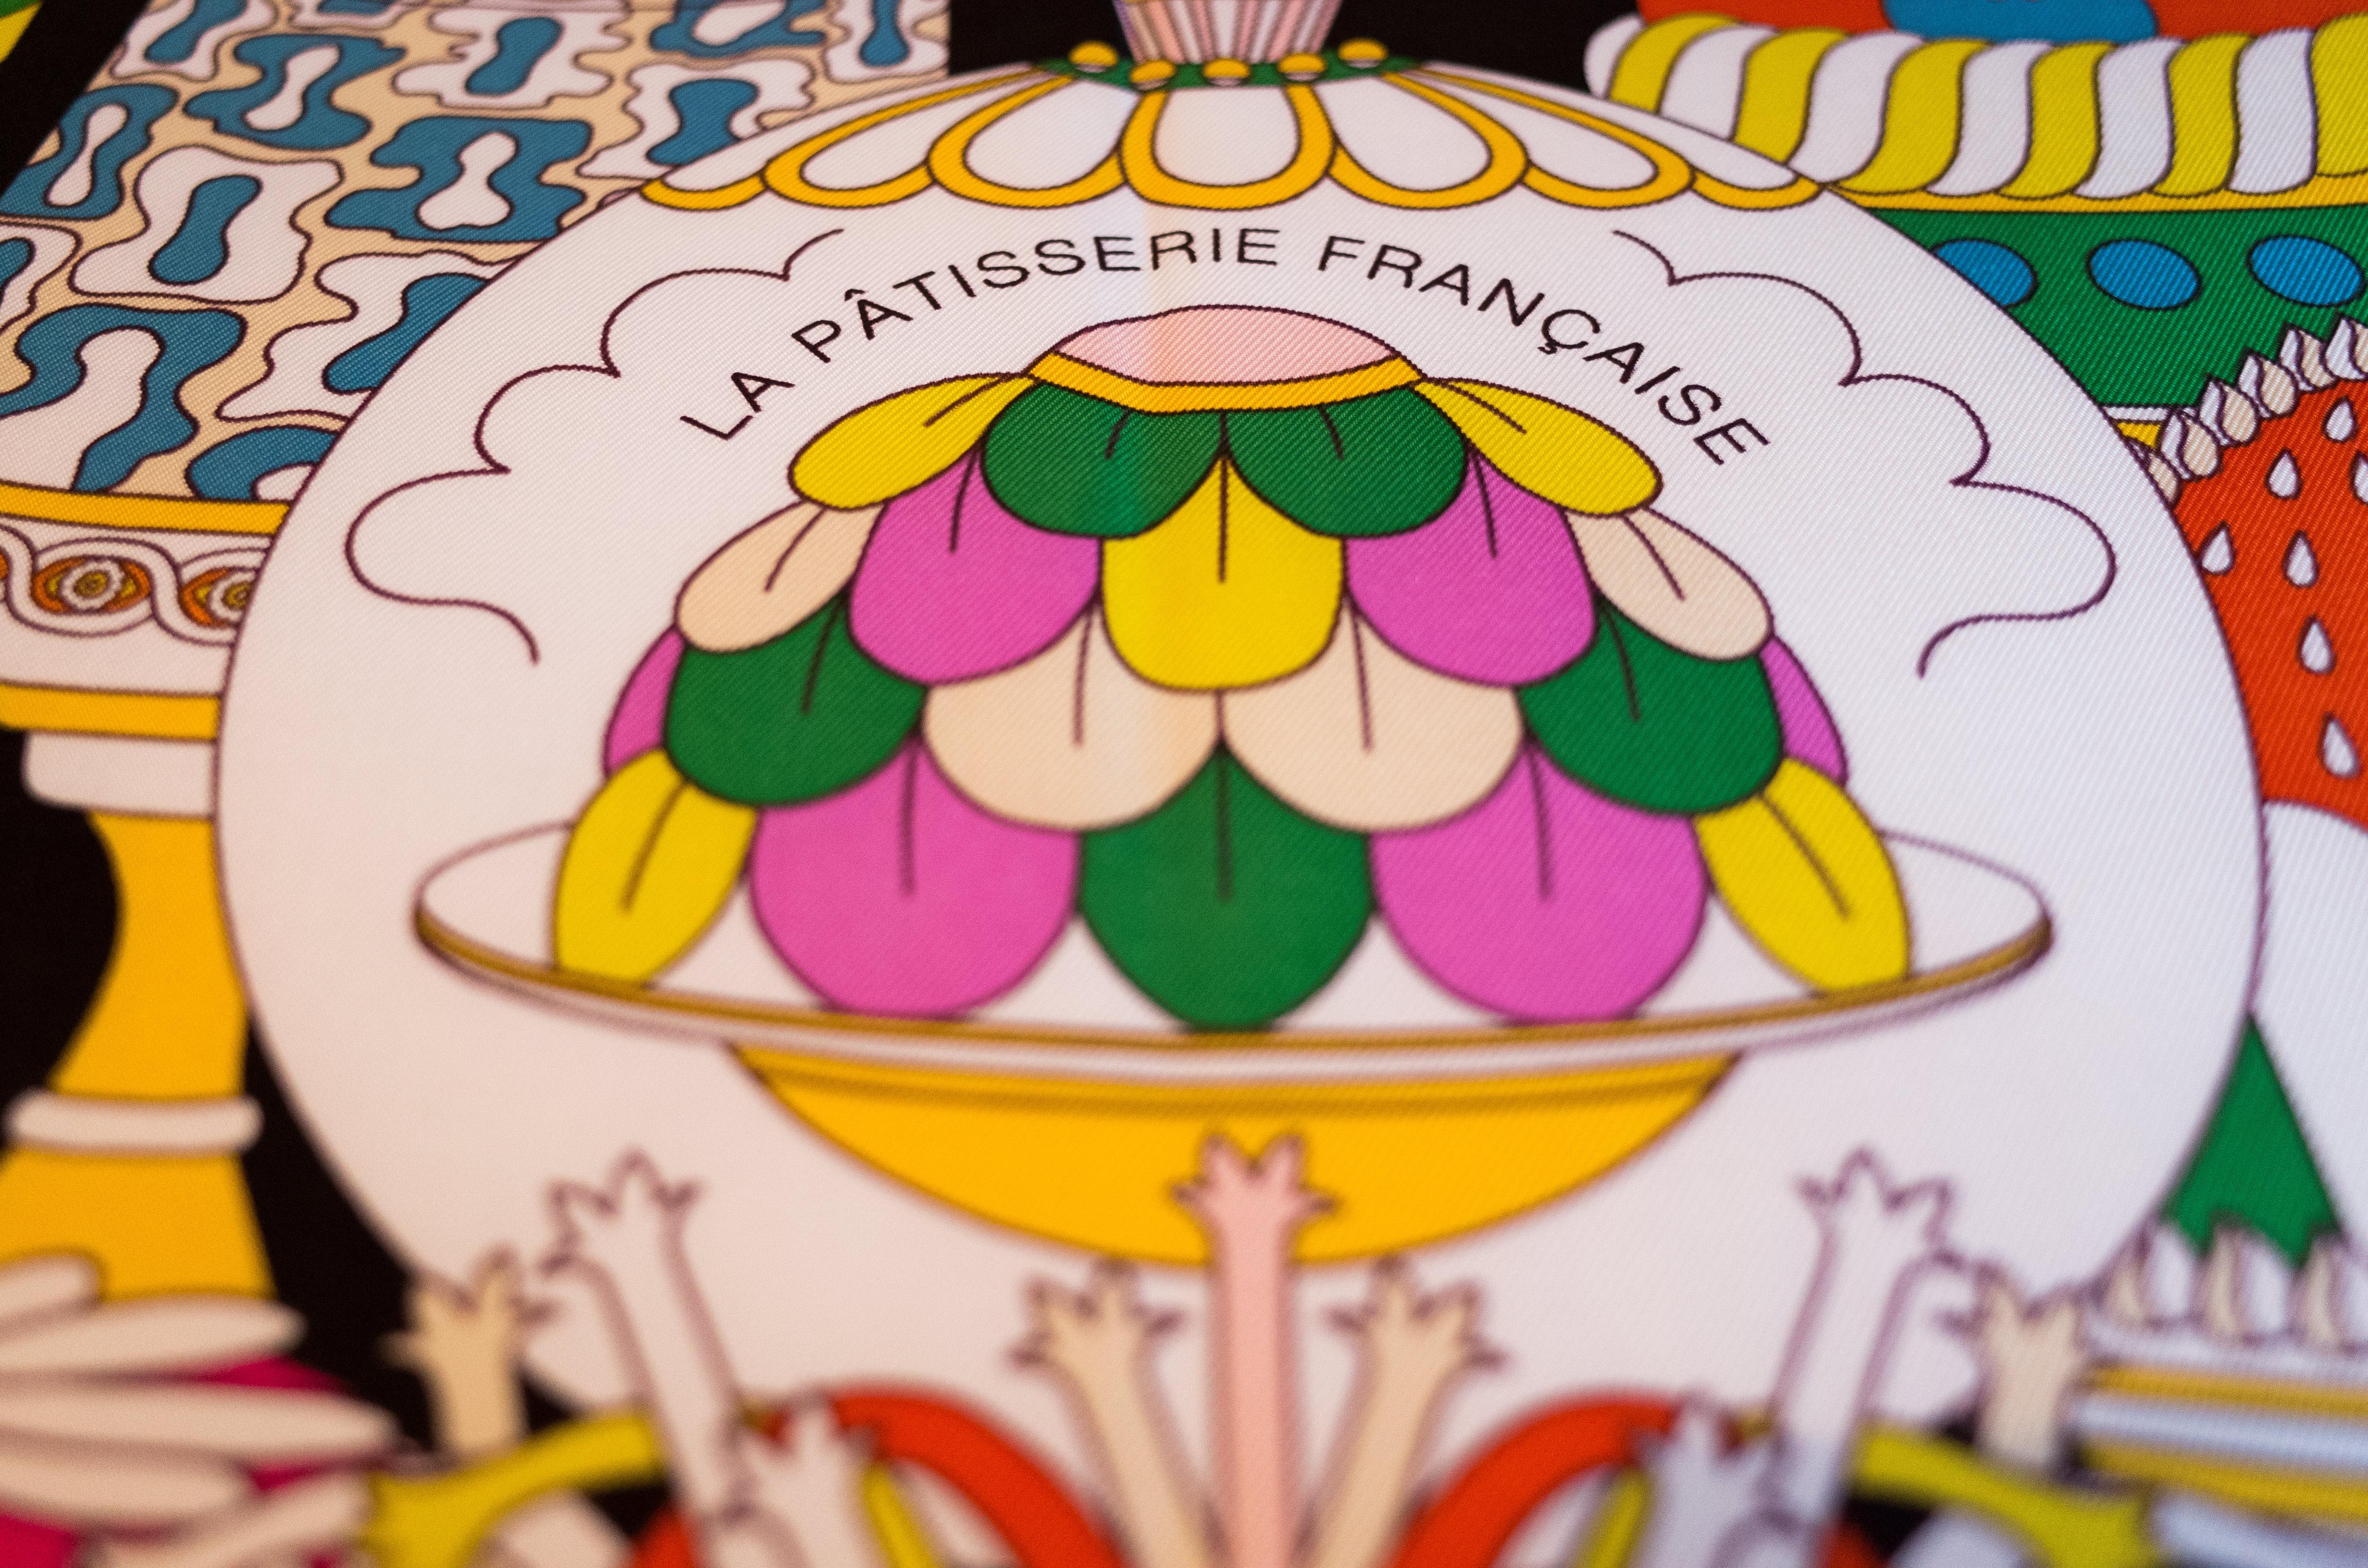 La Patisserie Francaise, hermes, hermes scarf, Pierre Marie, Hermes carre, how to wear an Hermes scarf